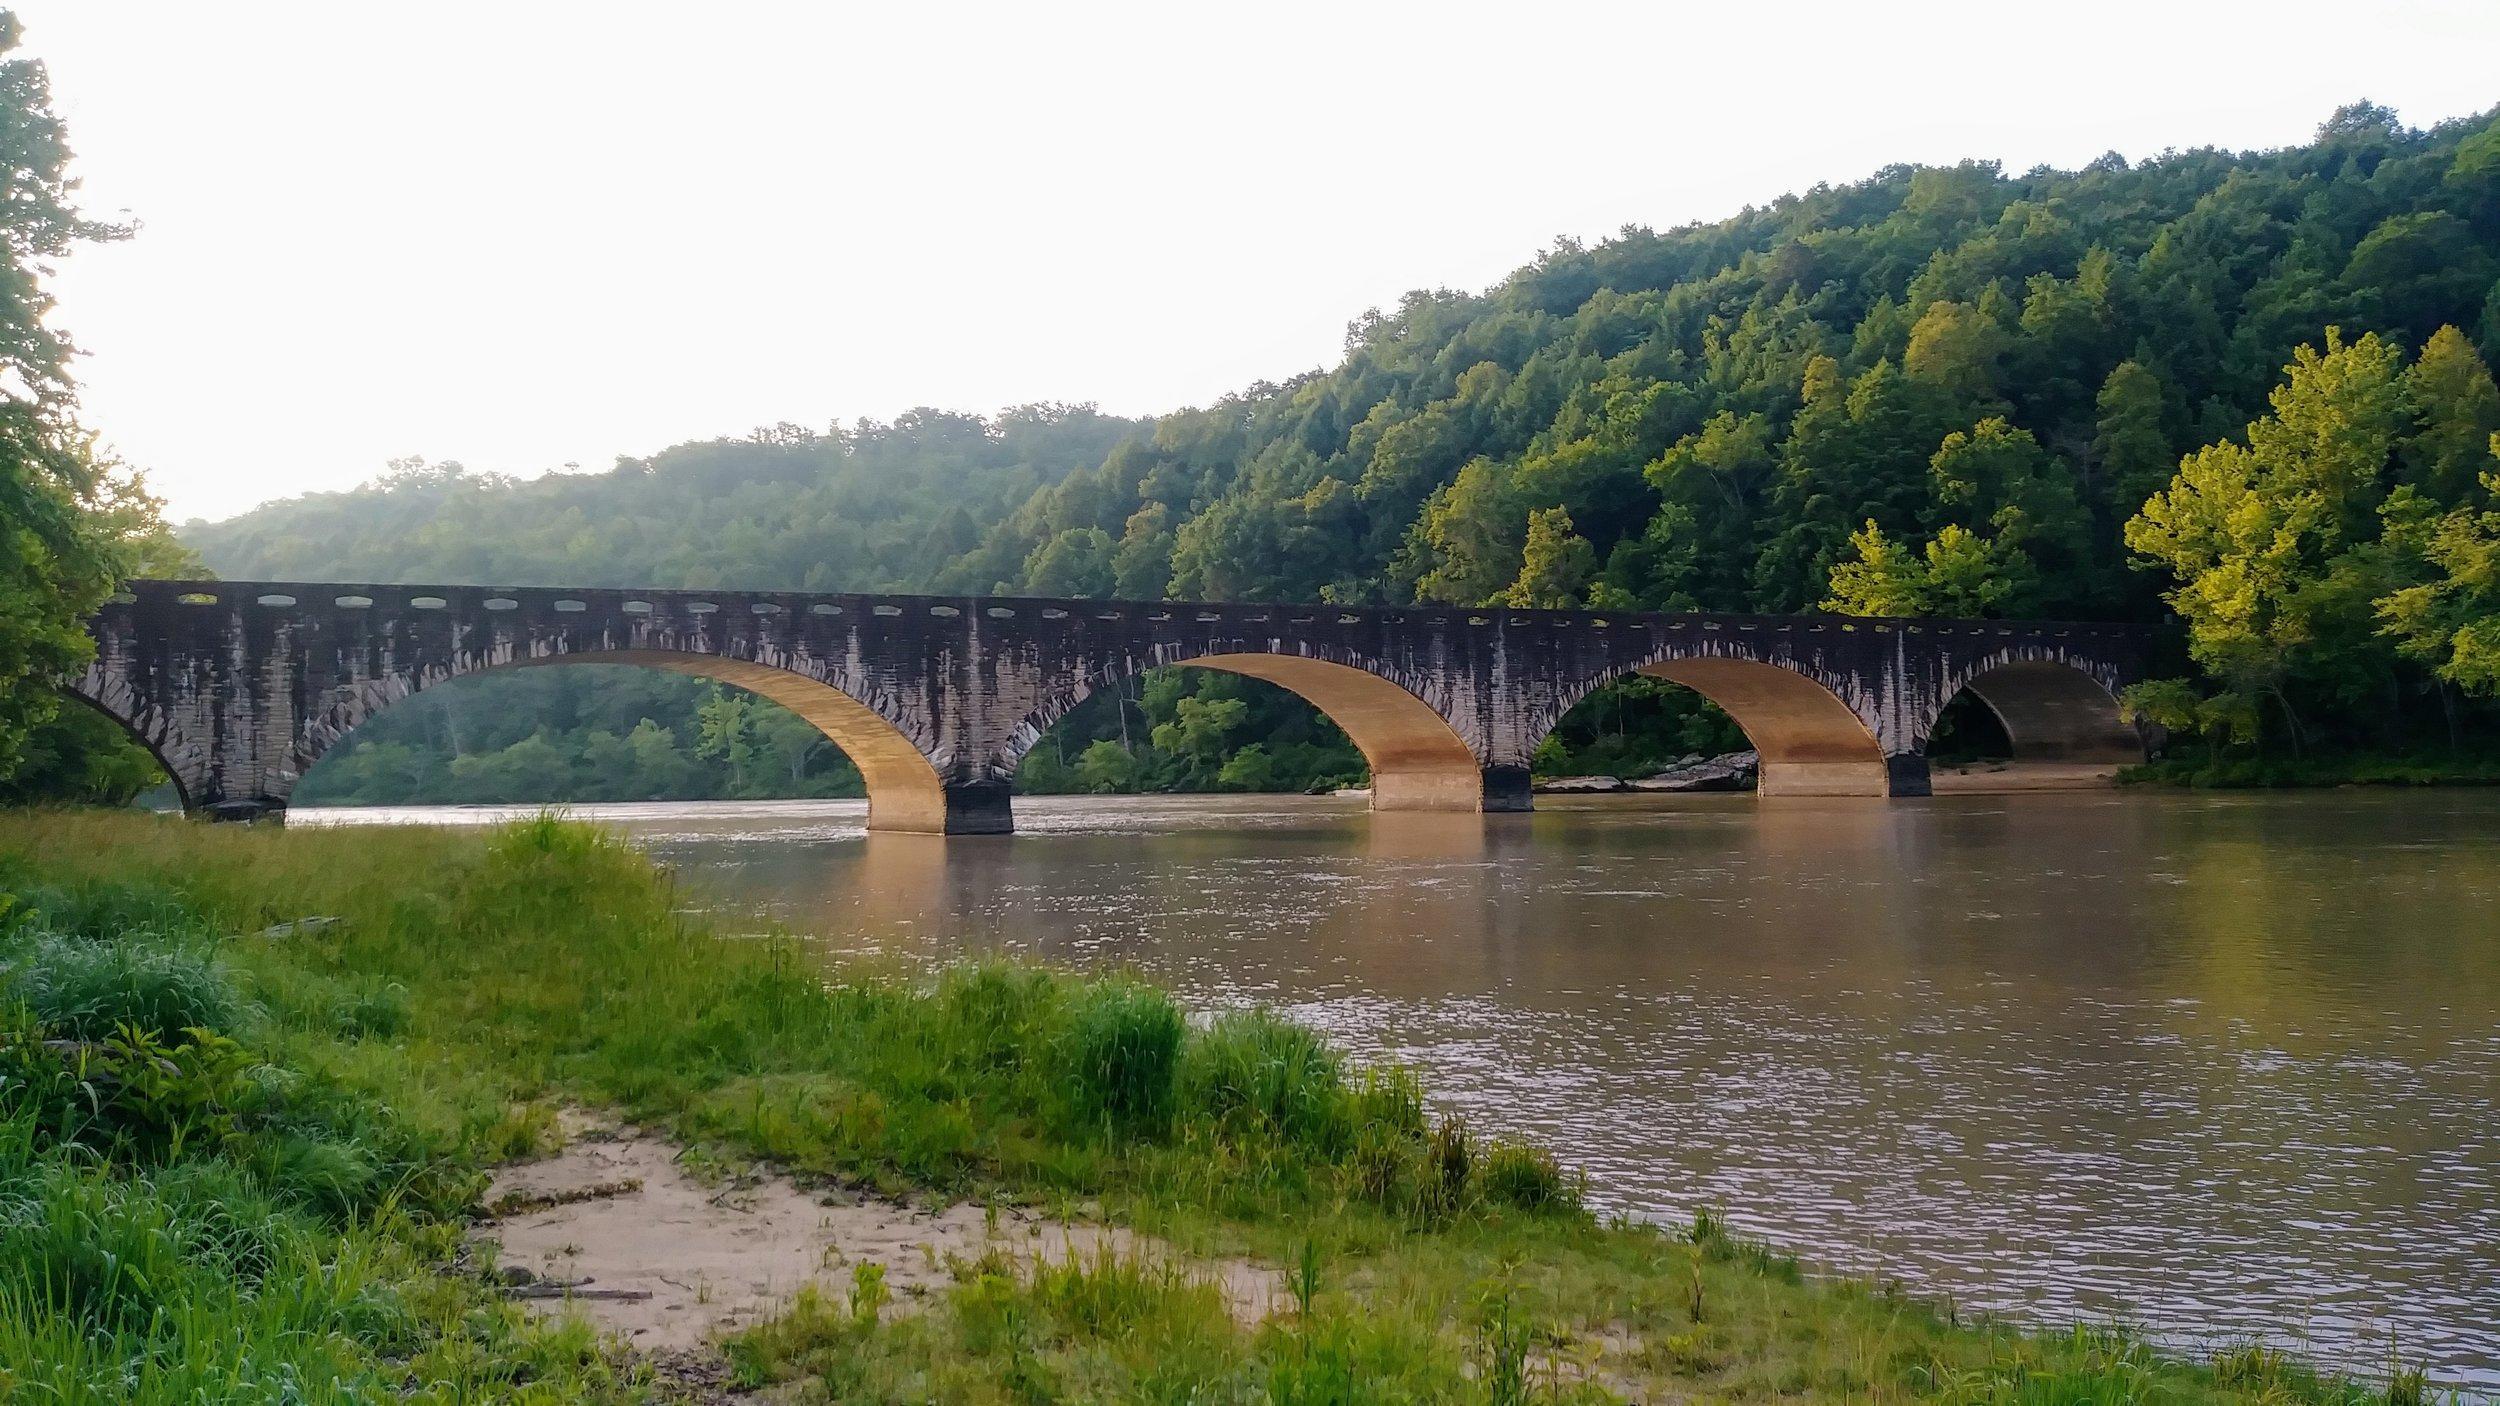 Edward Moss Gatliff Bridge on a glistening morning